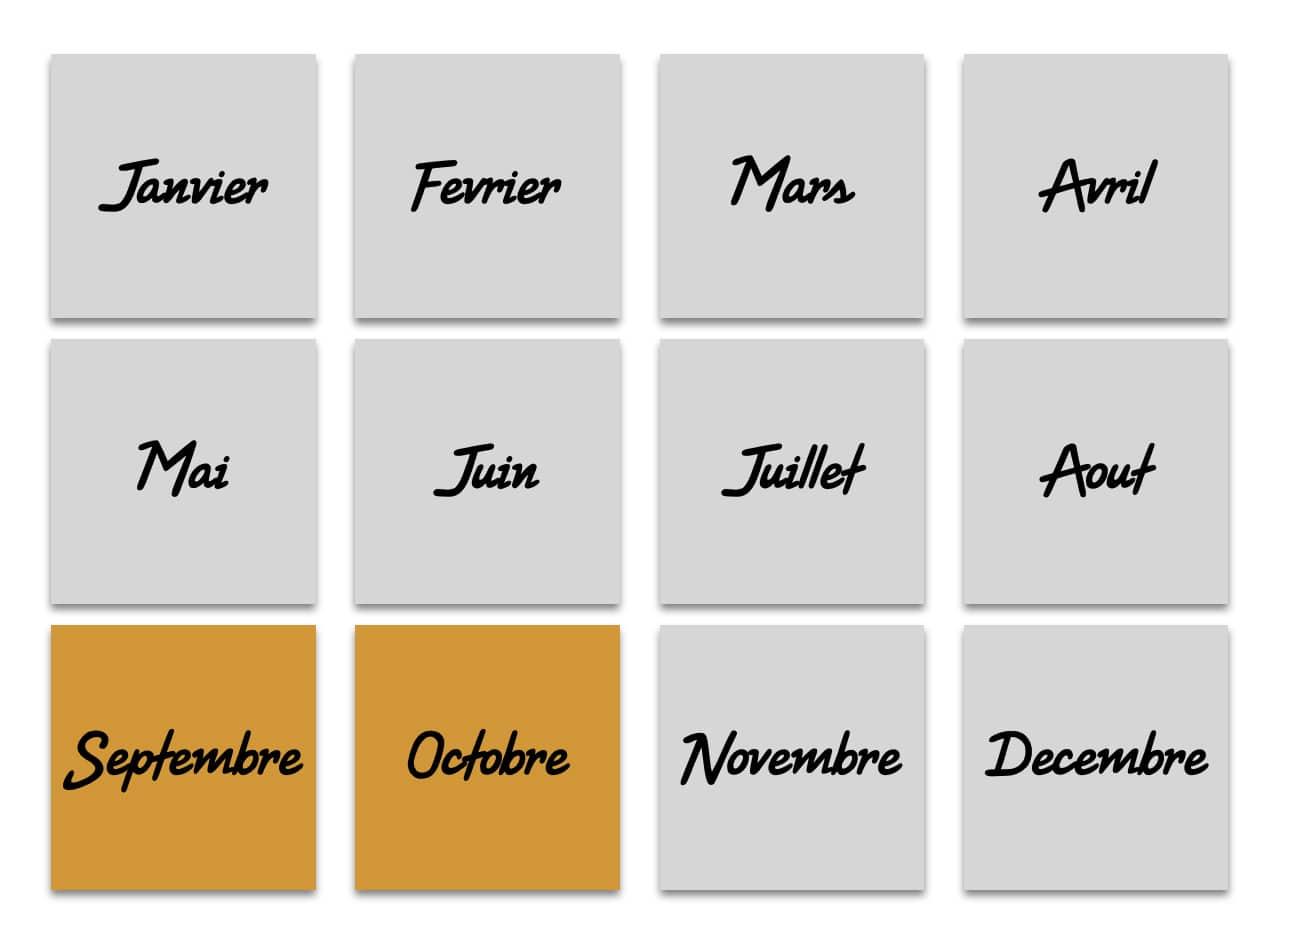 Septembre & Octobre